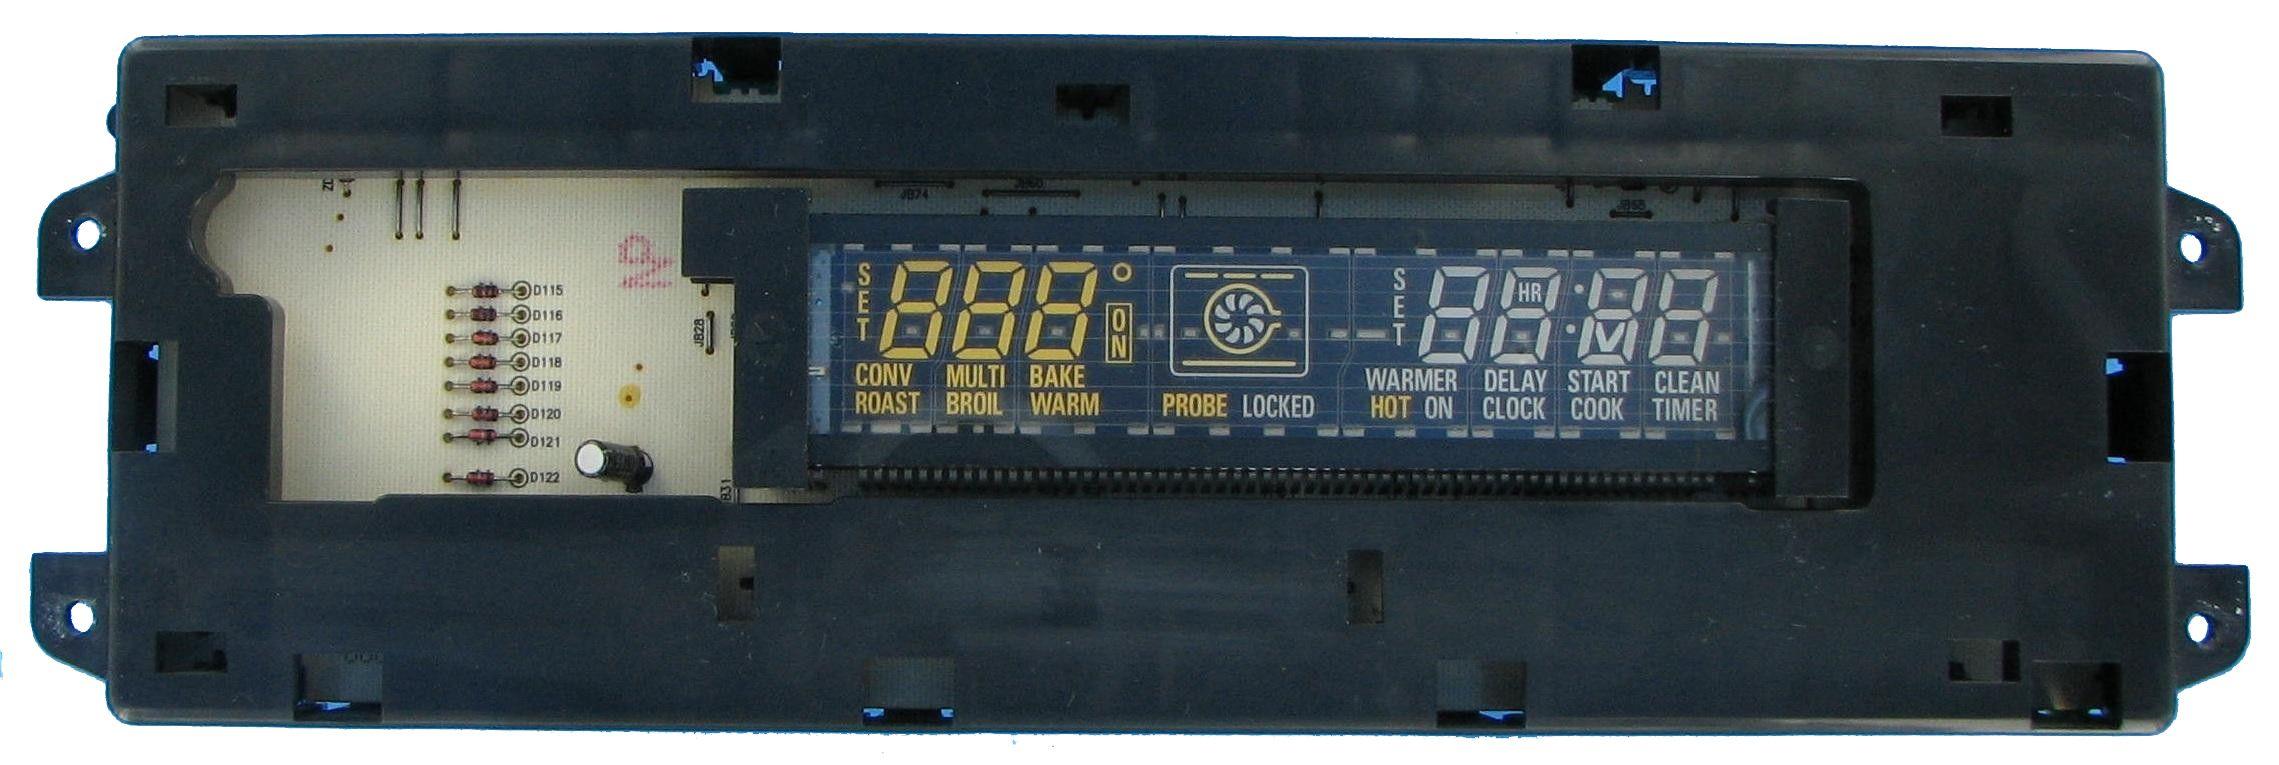 Ge wb27k10176 range electronic control board electric